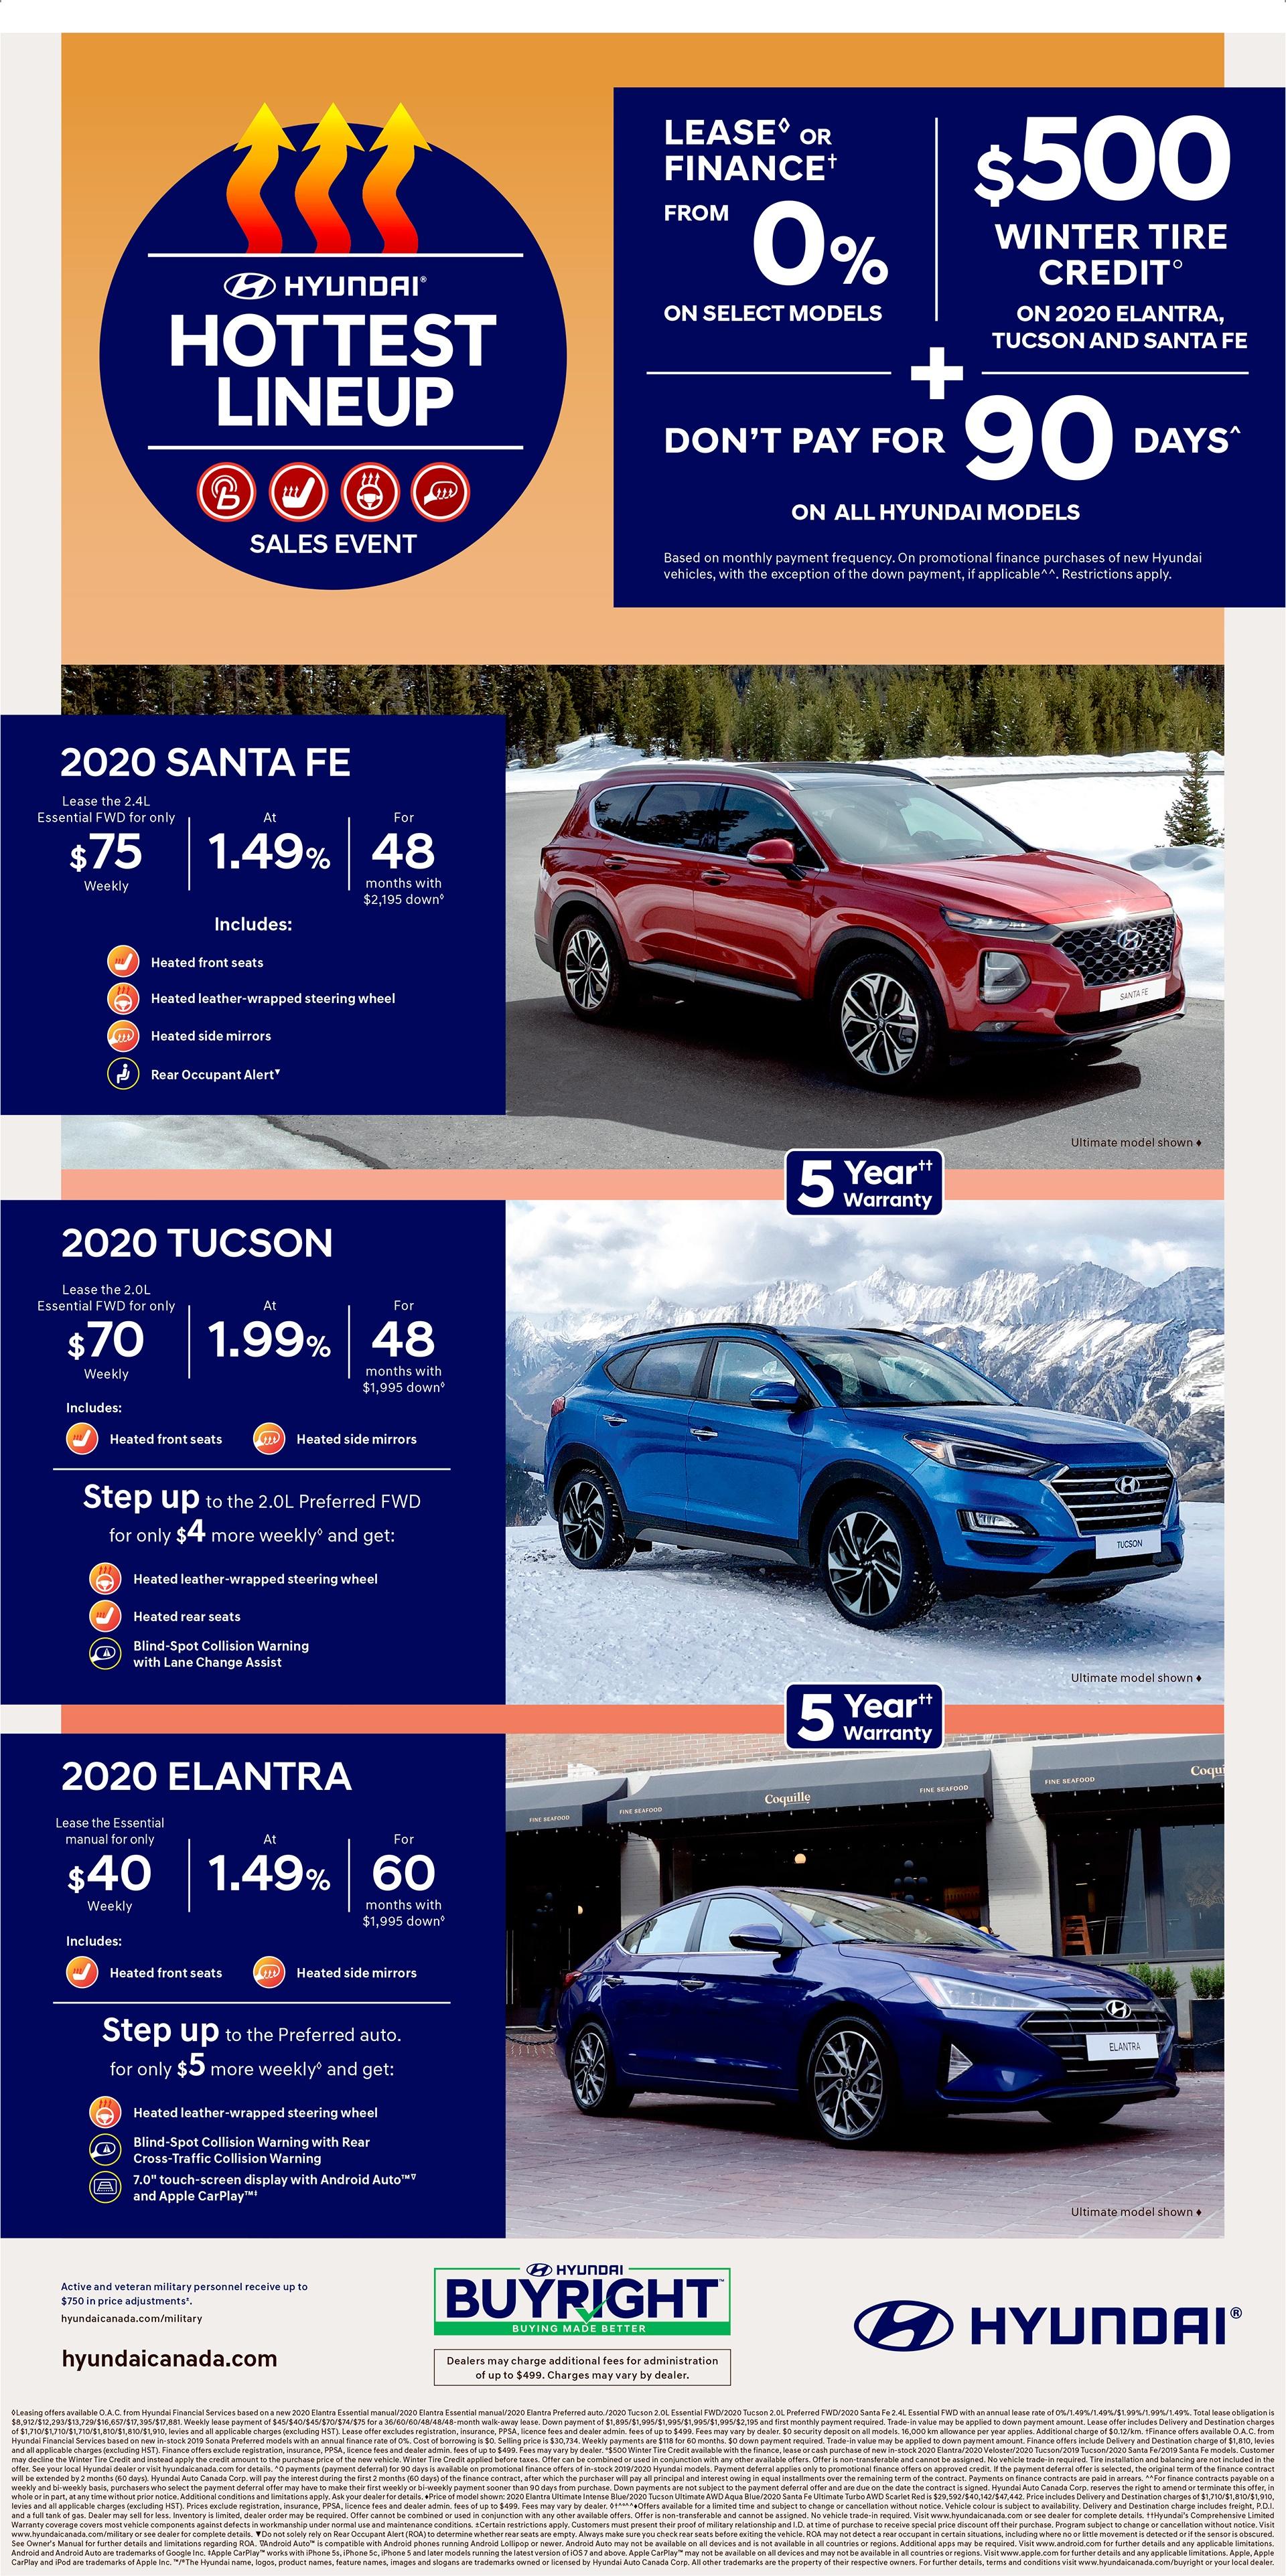 Hyundai-Hottest-LineUp-Promo